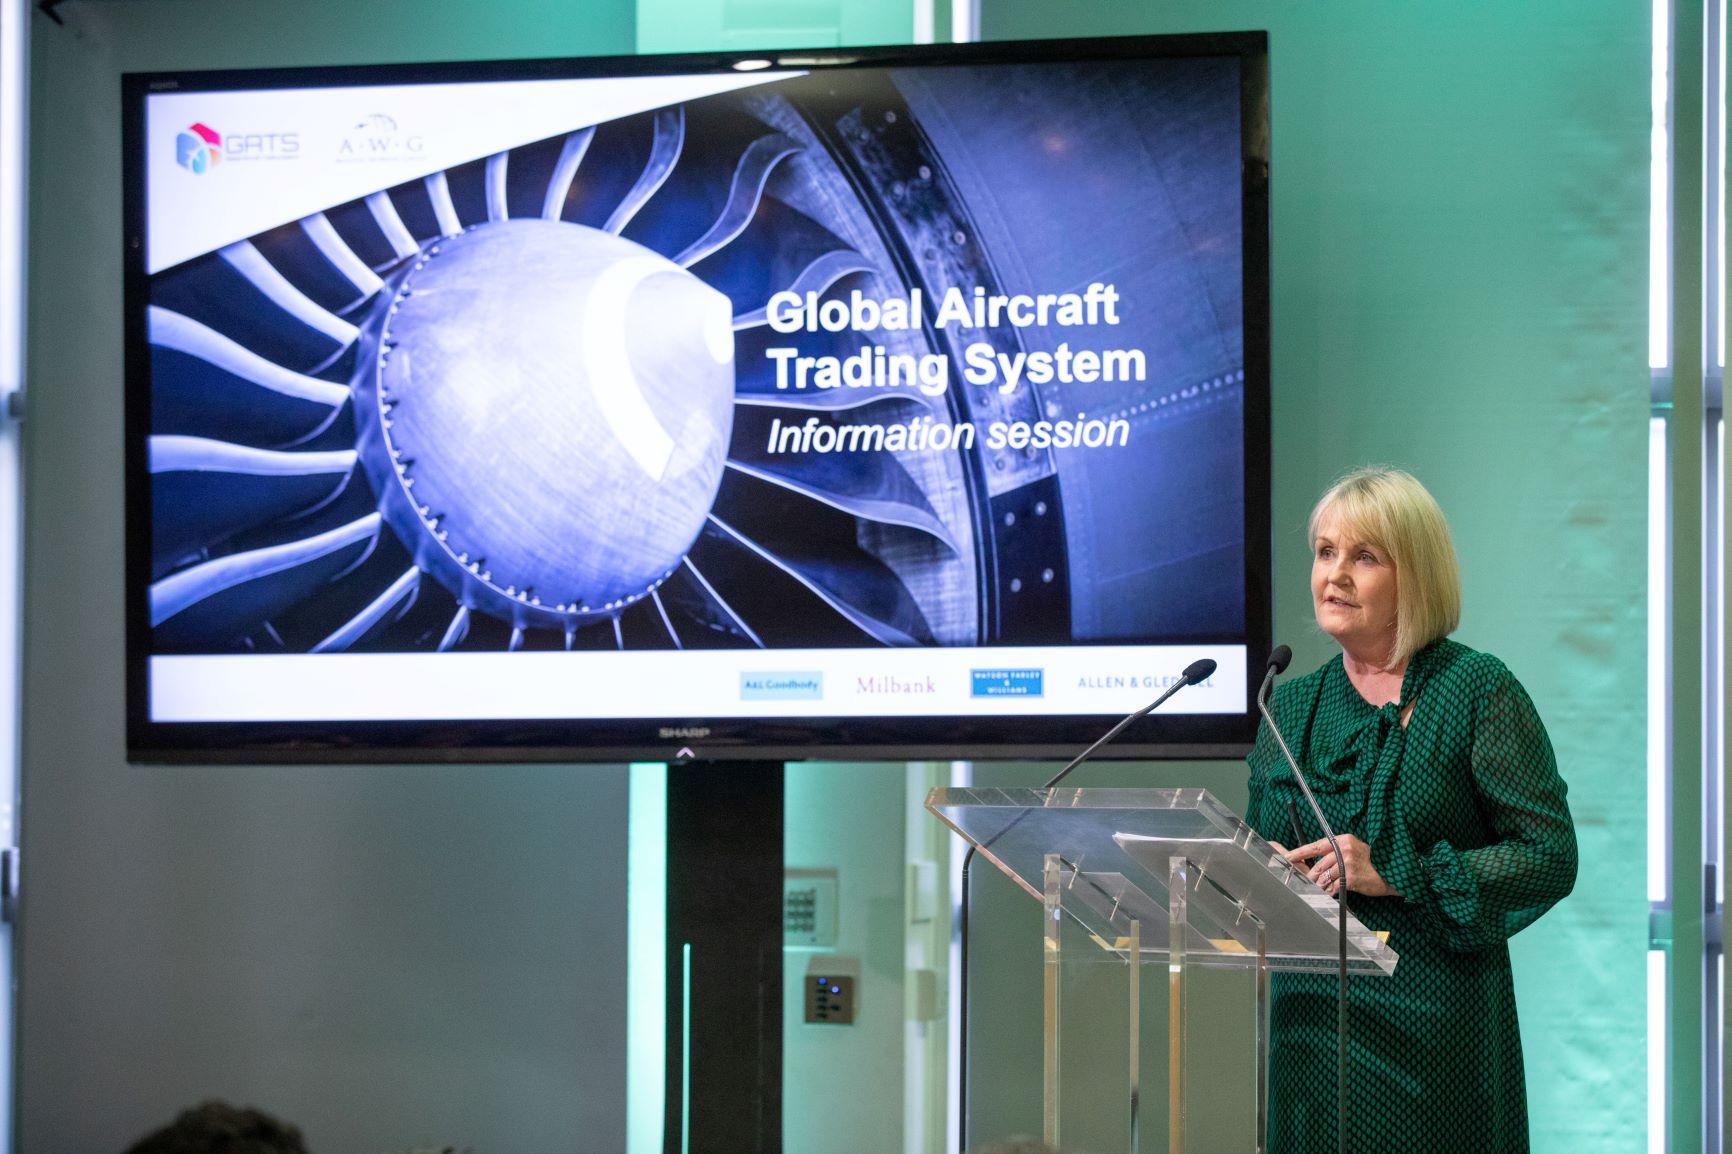 ALG Aviation GATS event